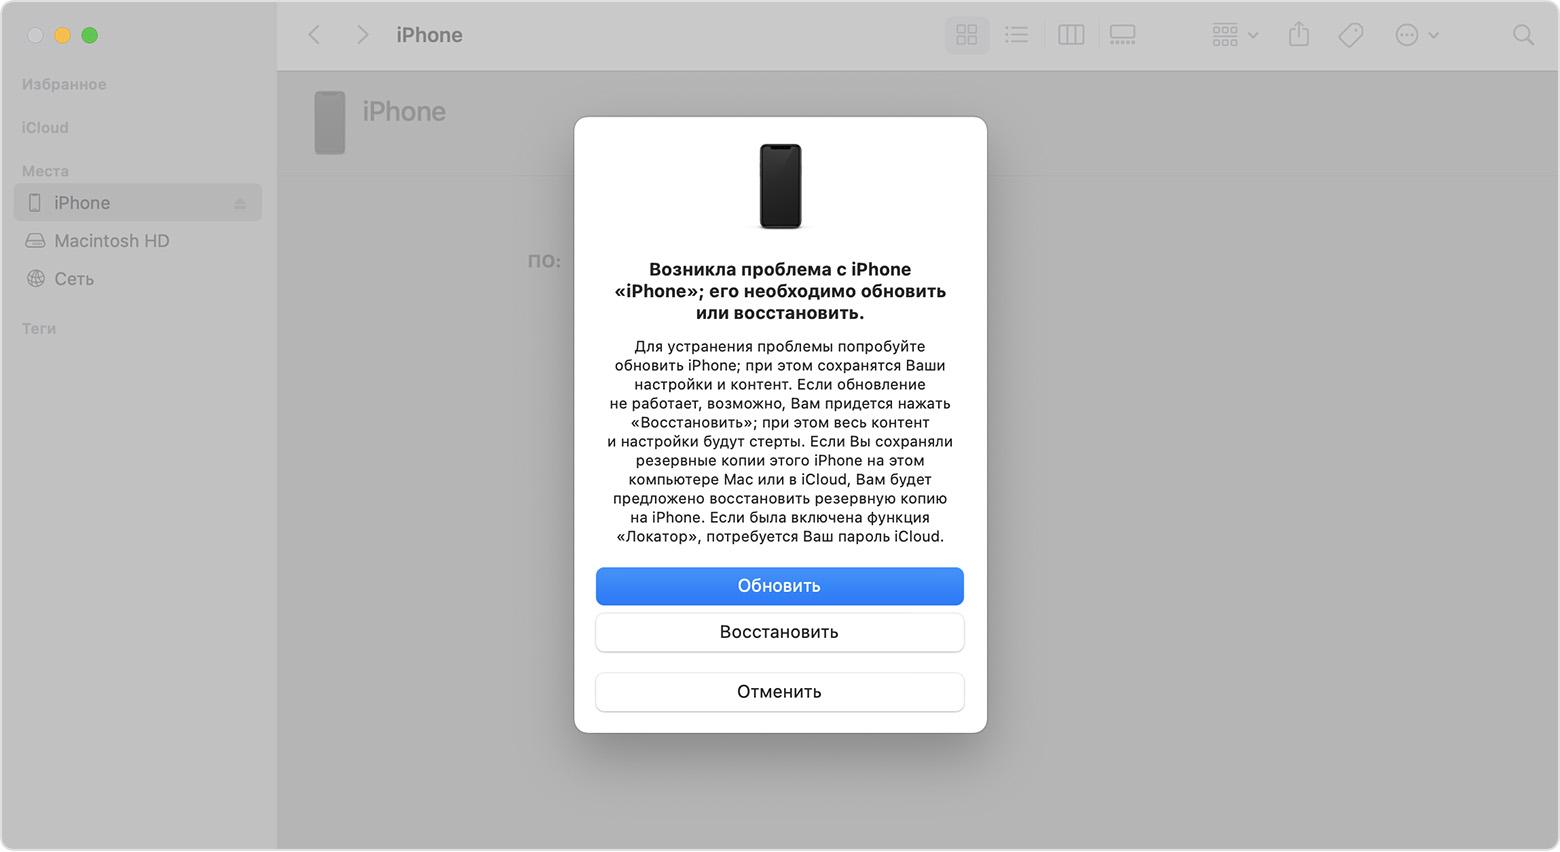 ios14-macos-big-sur-recovery-mode-iphone-update.jpg